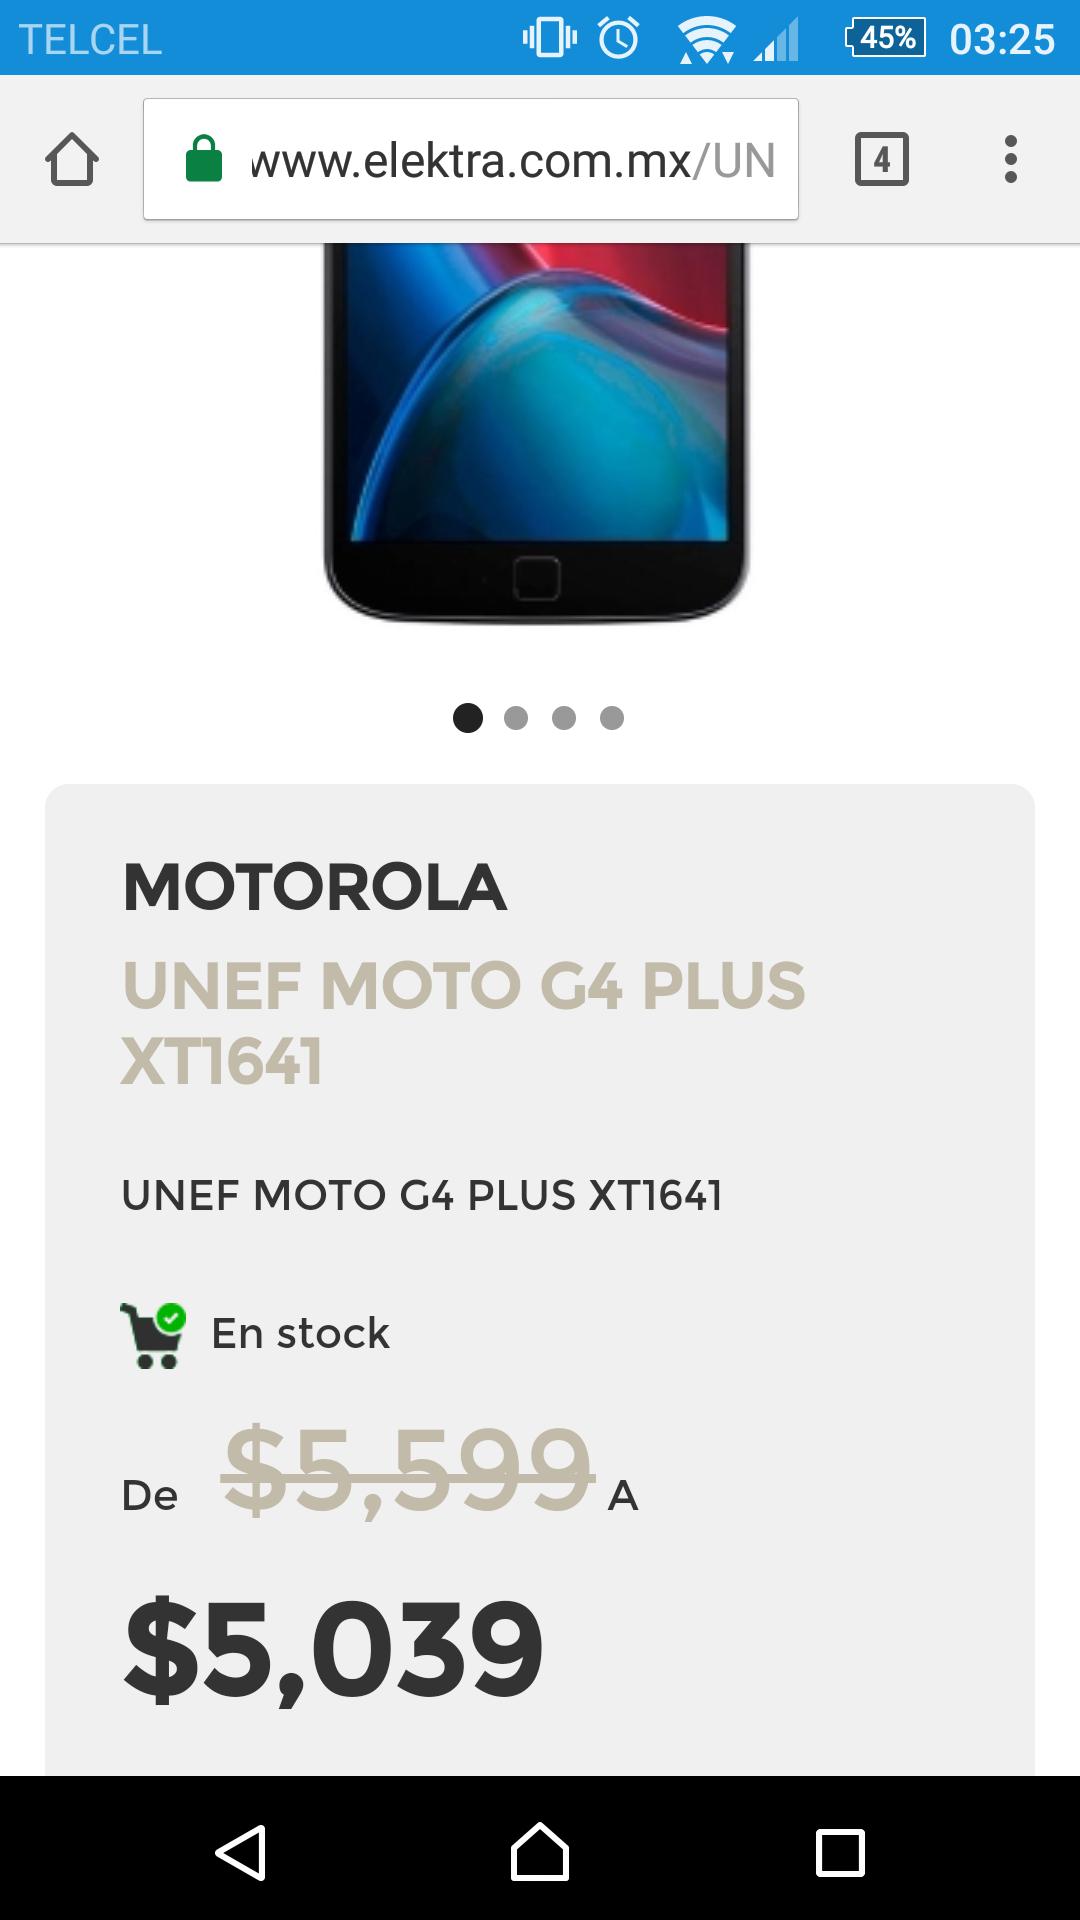 Buen Fin 2016 Elektra: Unefon Moto G4 Plus XT1641 a $5,039 + 18 MSI